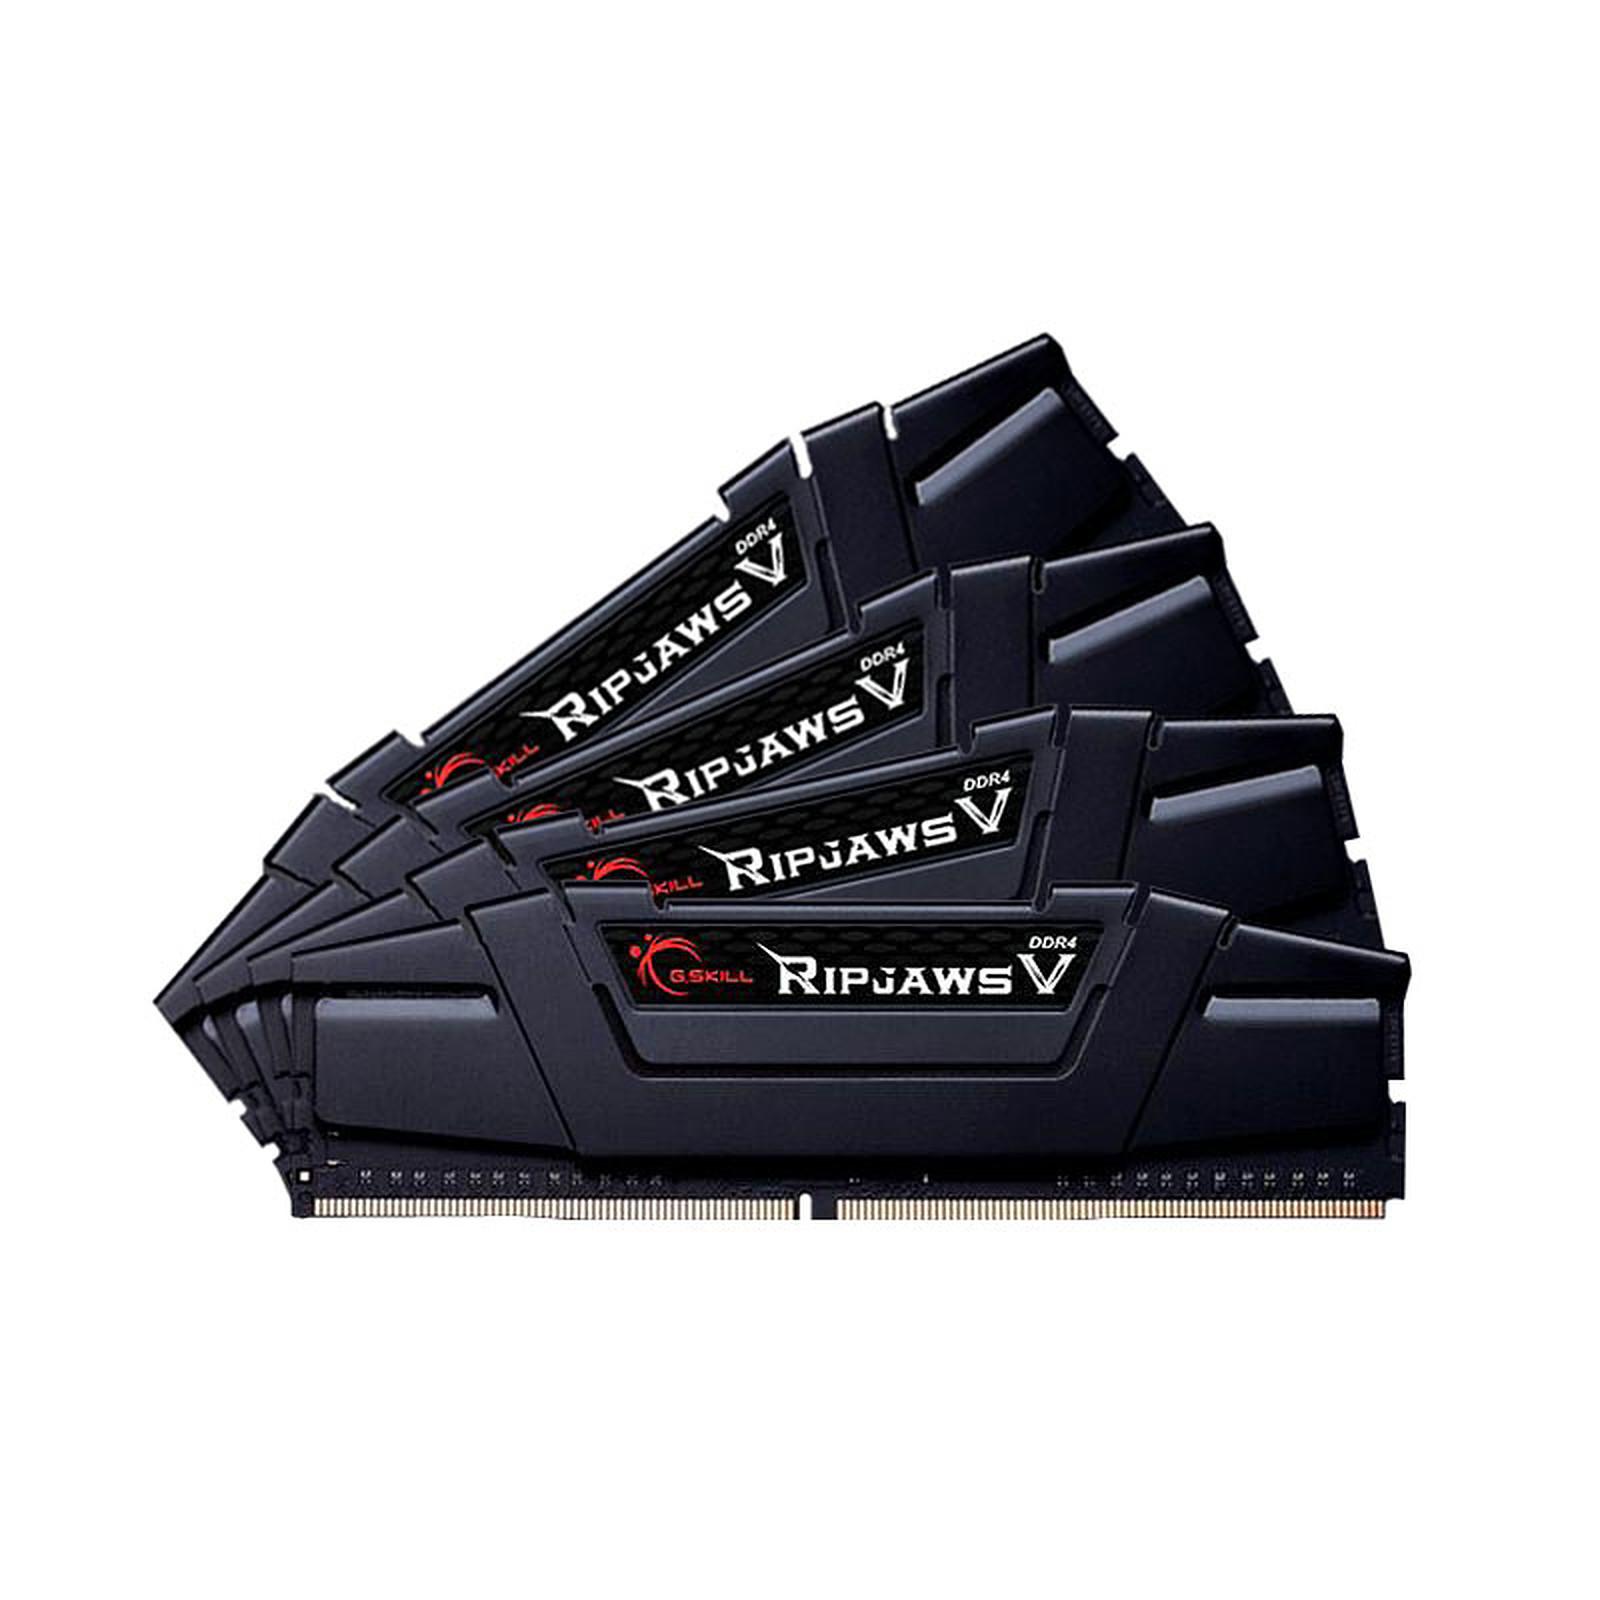 G.Skill RipJaws 5 Series Noir 16 Go (4x 4 Go) DDR4 3466 MHz CL16